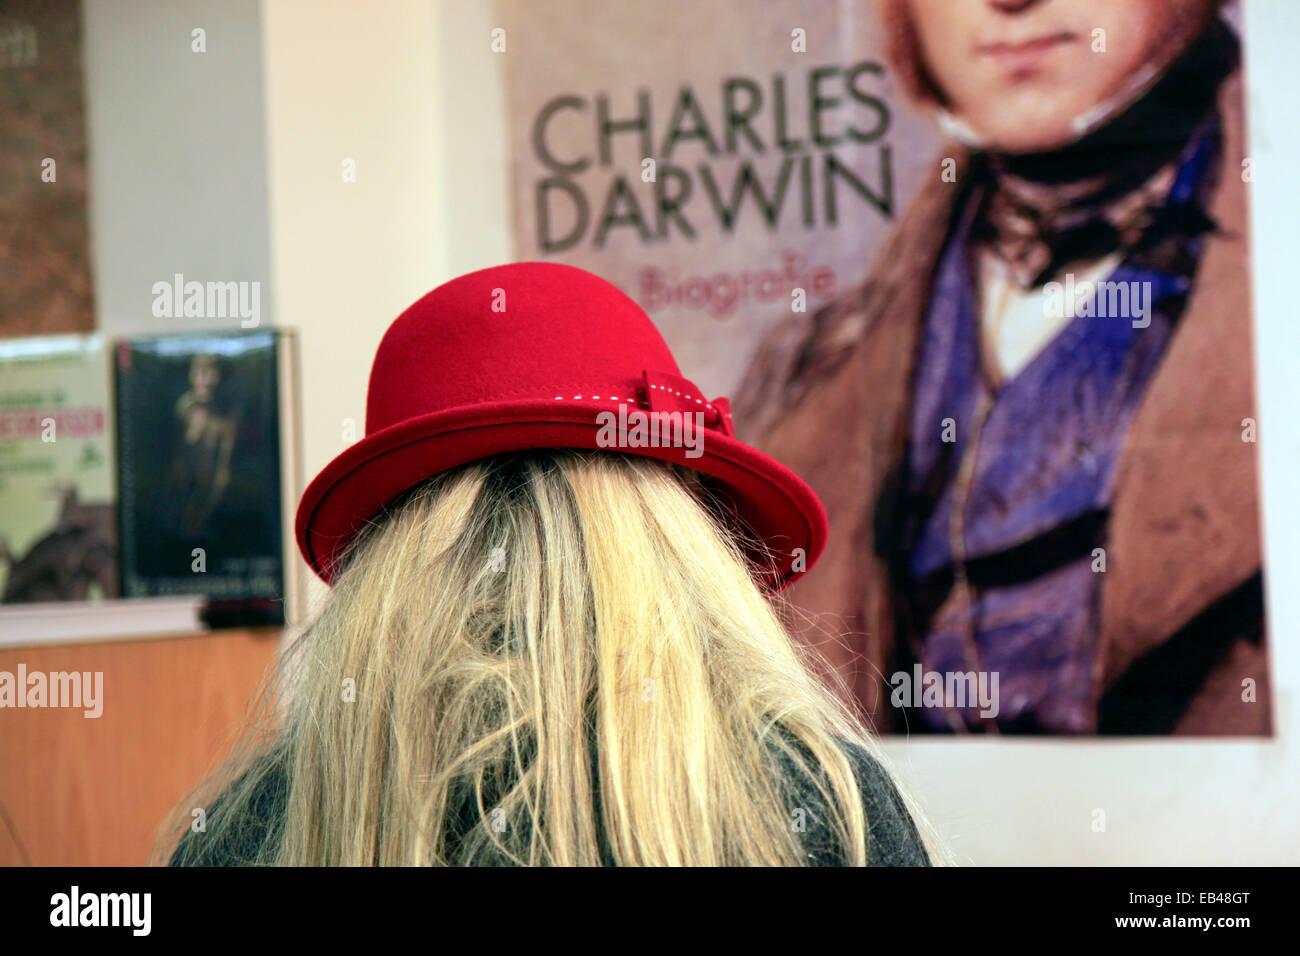 Charles Darwin and Evolution - Stock Image